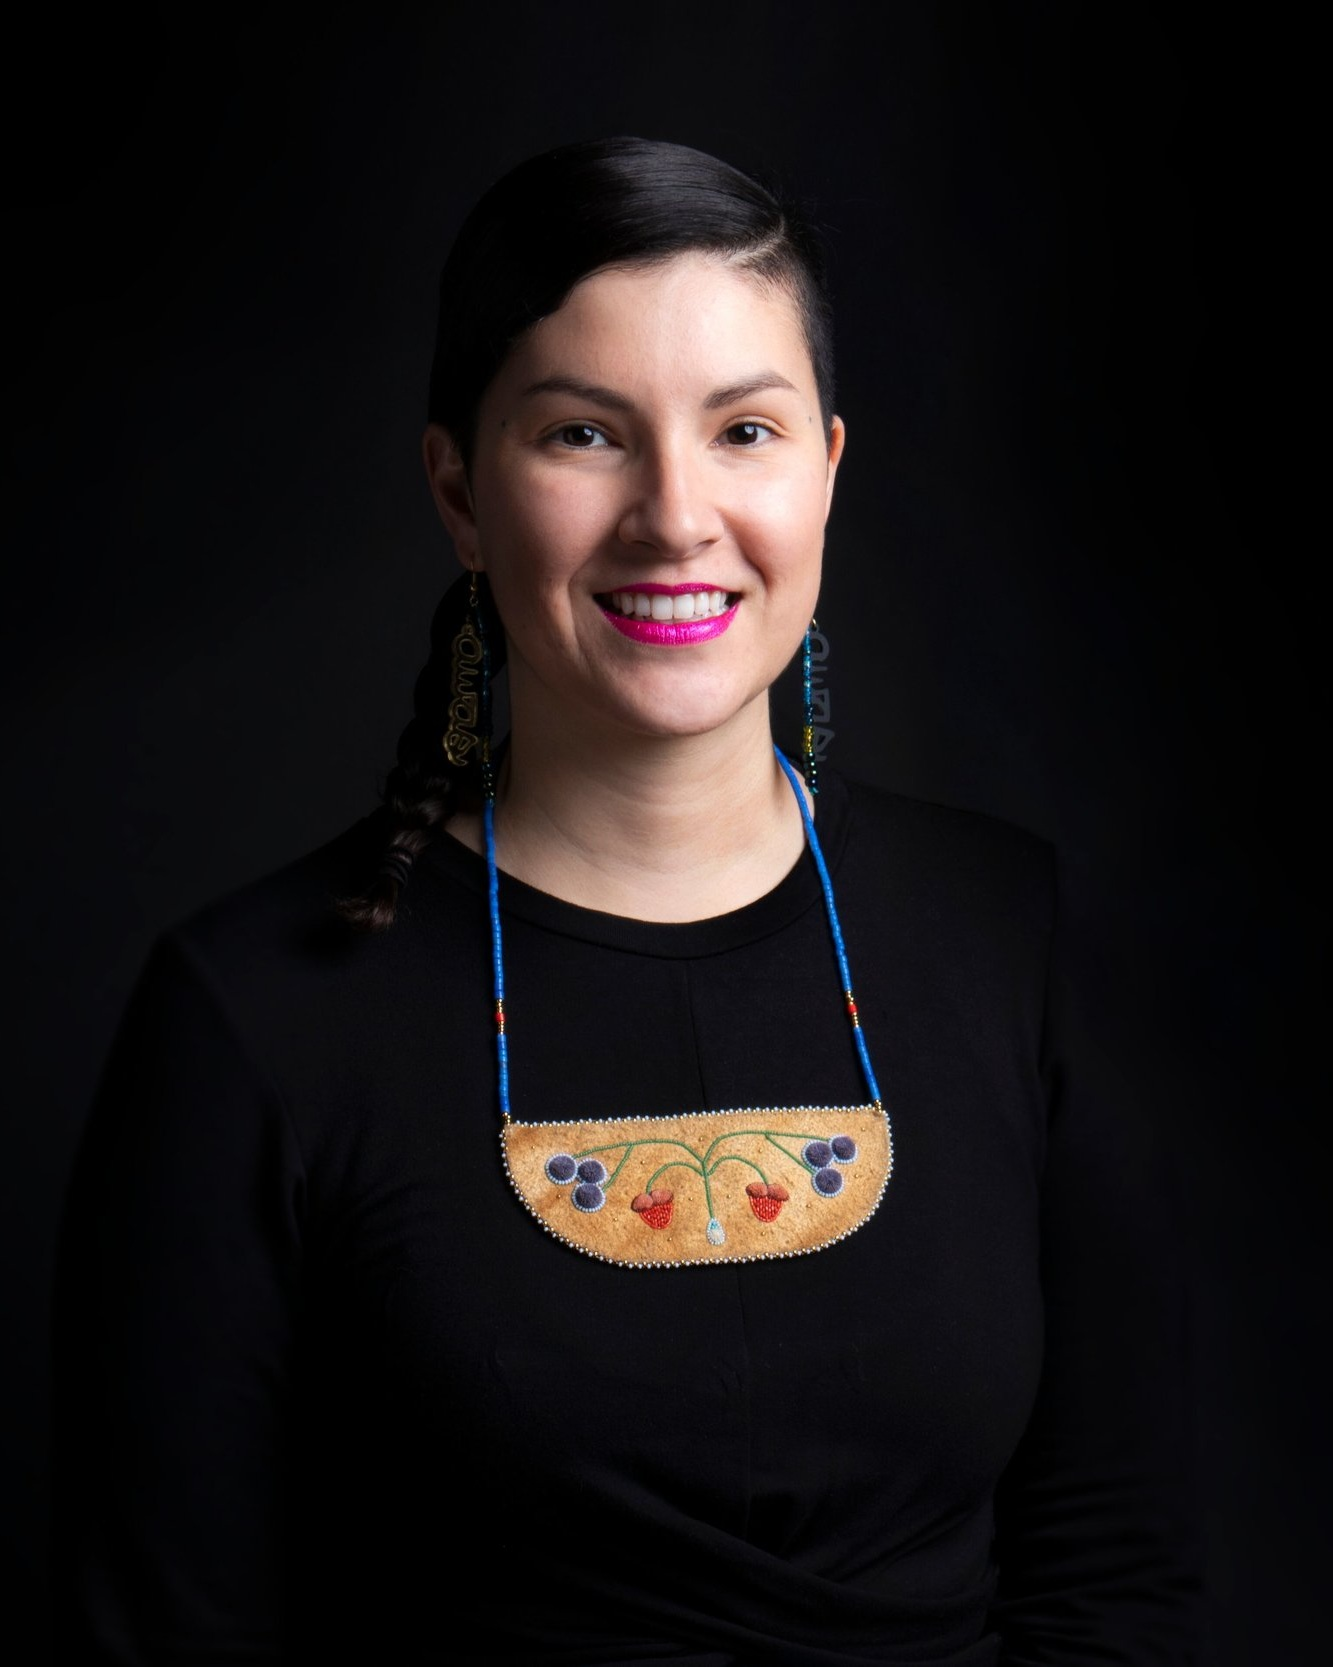 Amy Malbeuf